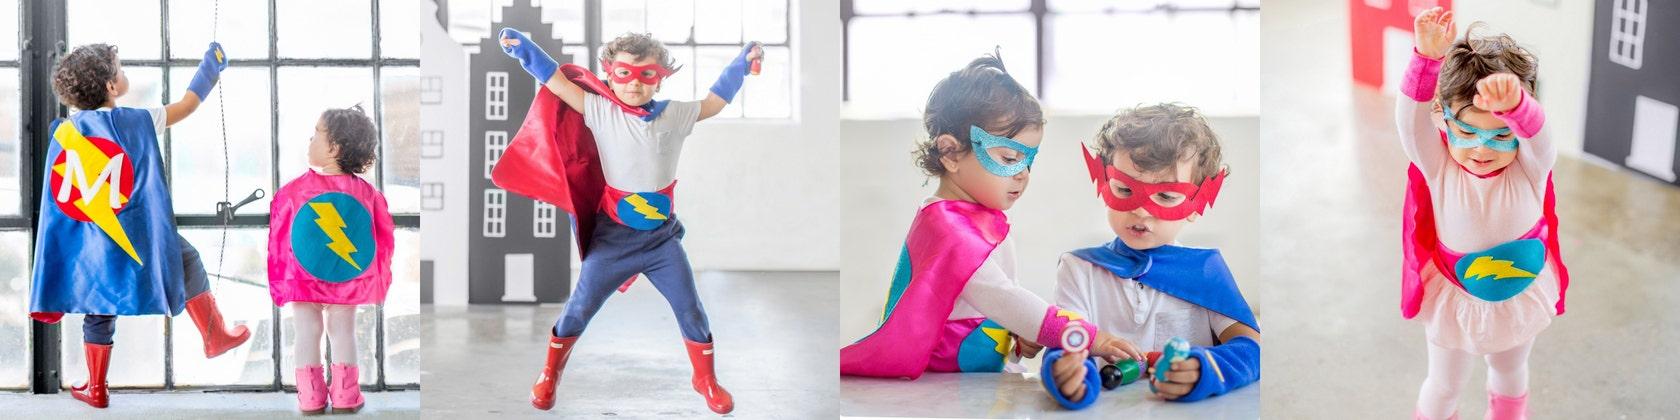 Personalized Superhero Capes Superhero Parties von superkidcapes